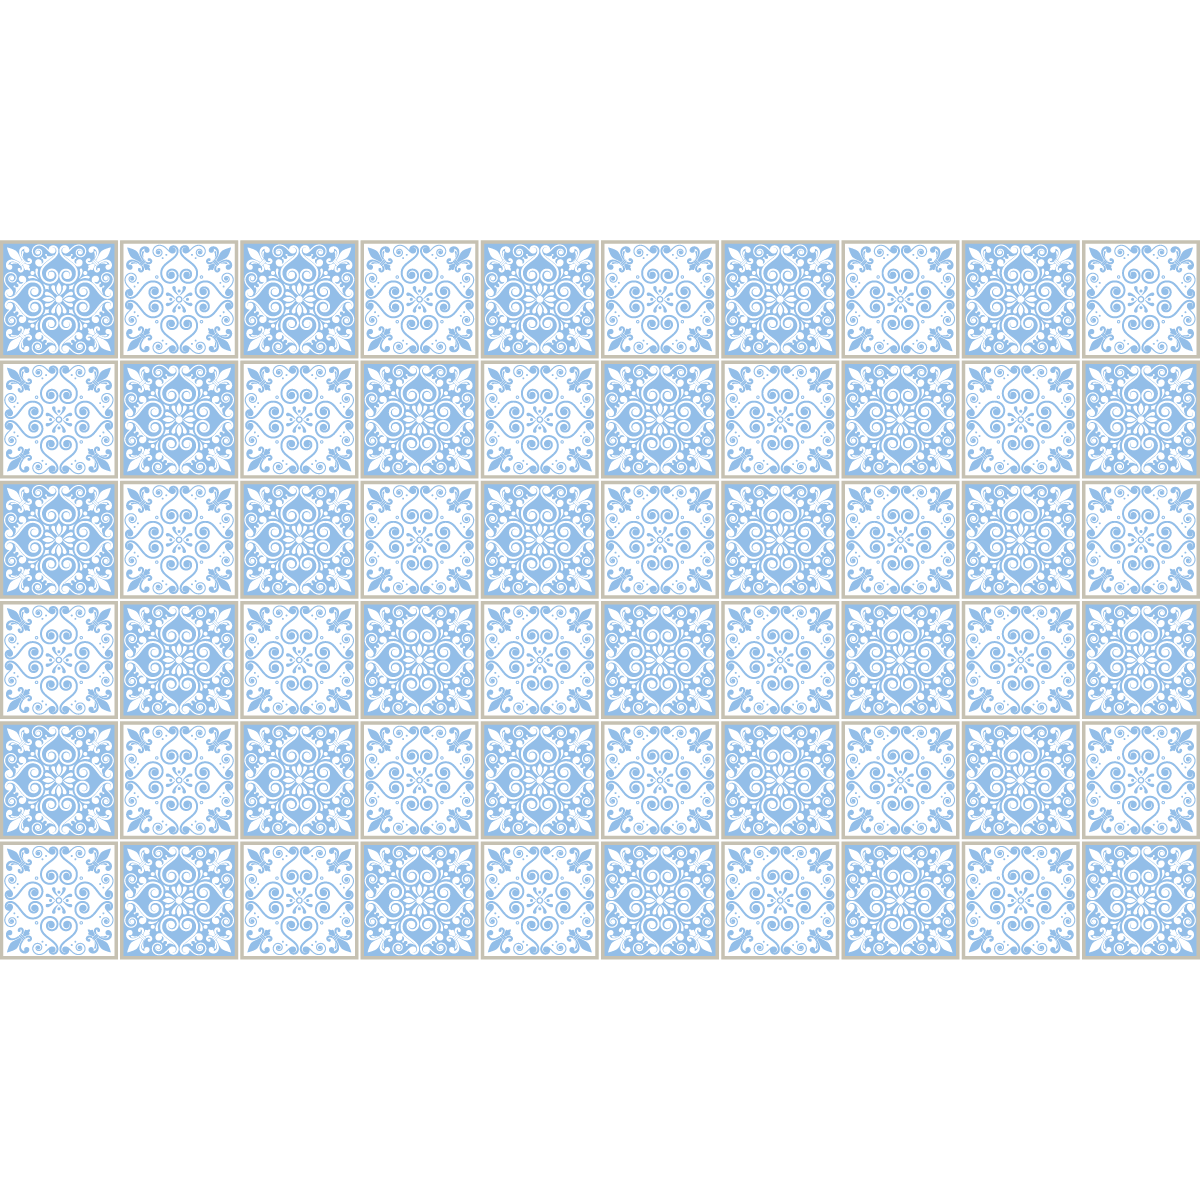 60 stickers carrelages azulejos gloria salle de bain et. Black Bedroom Furniture Sets. Home Design Ideas